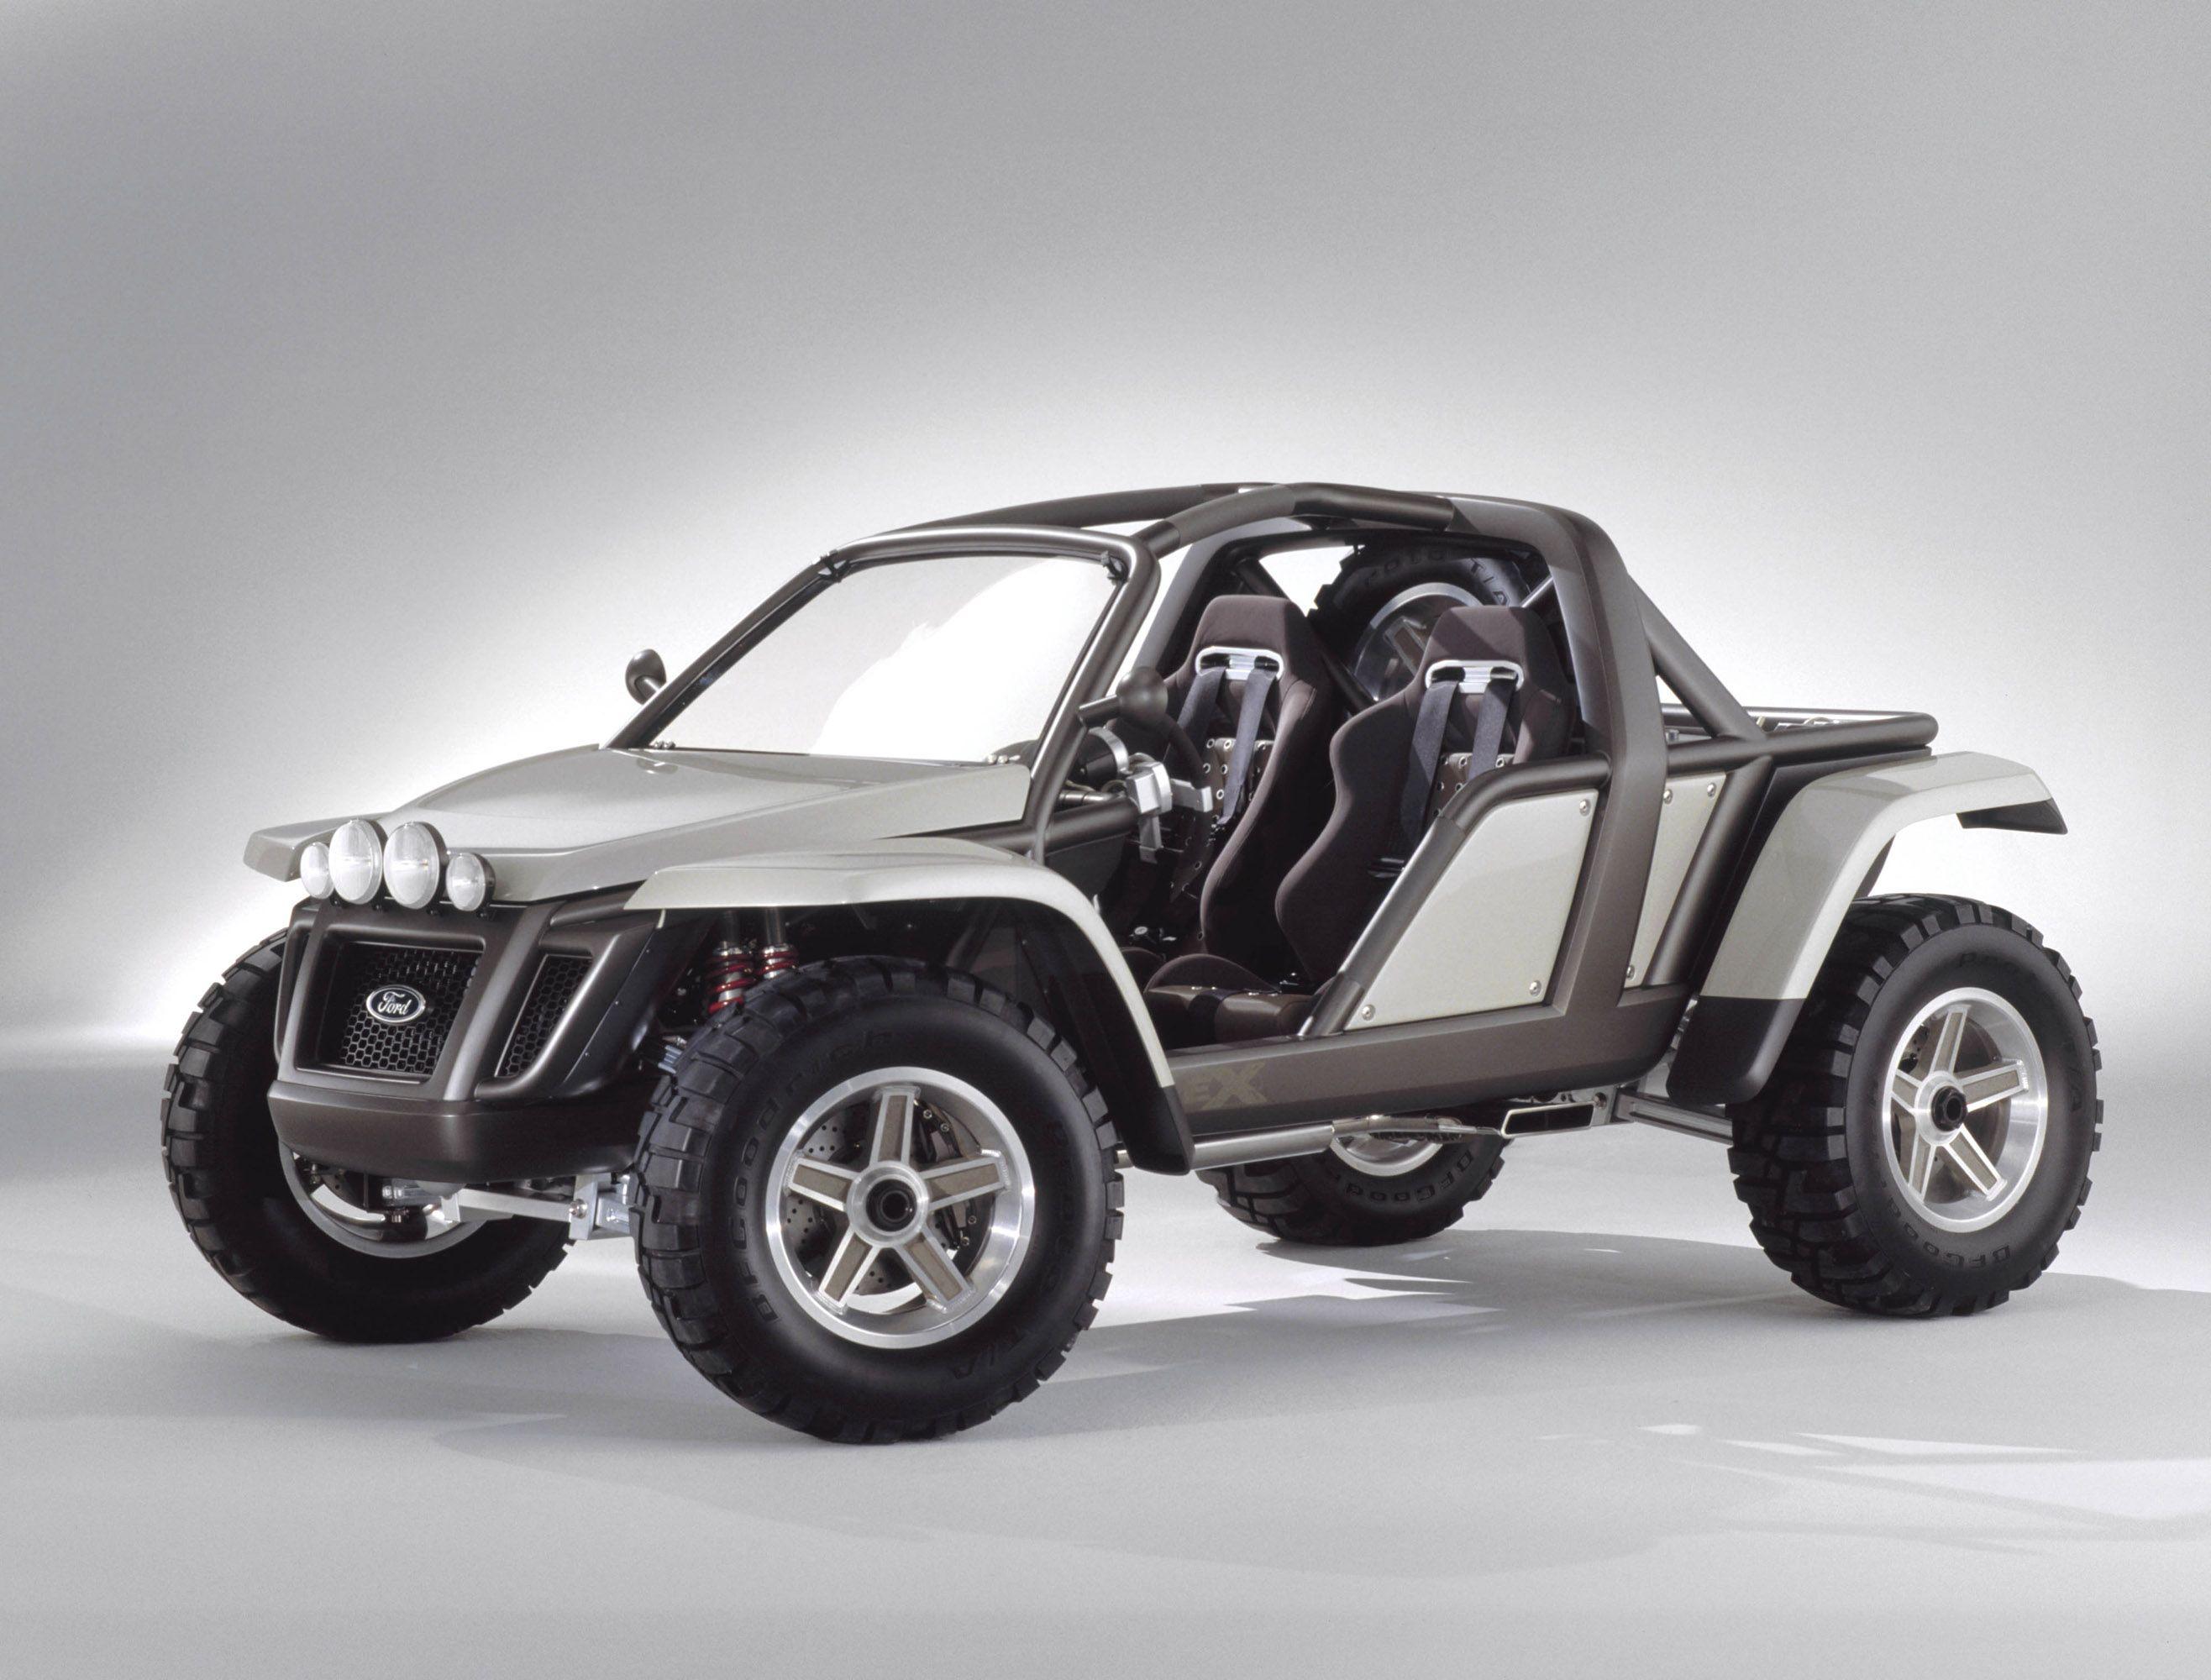 Ford Ex Concept Picture 1 Projetos De Carros Carros Jeep